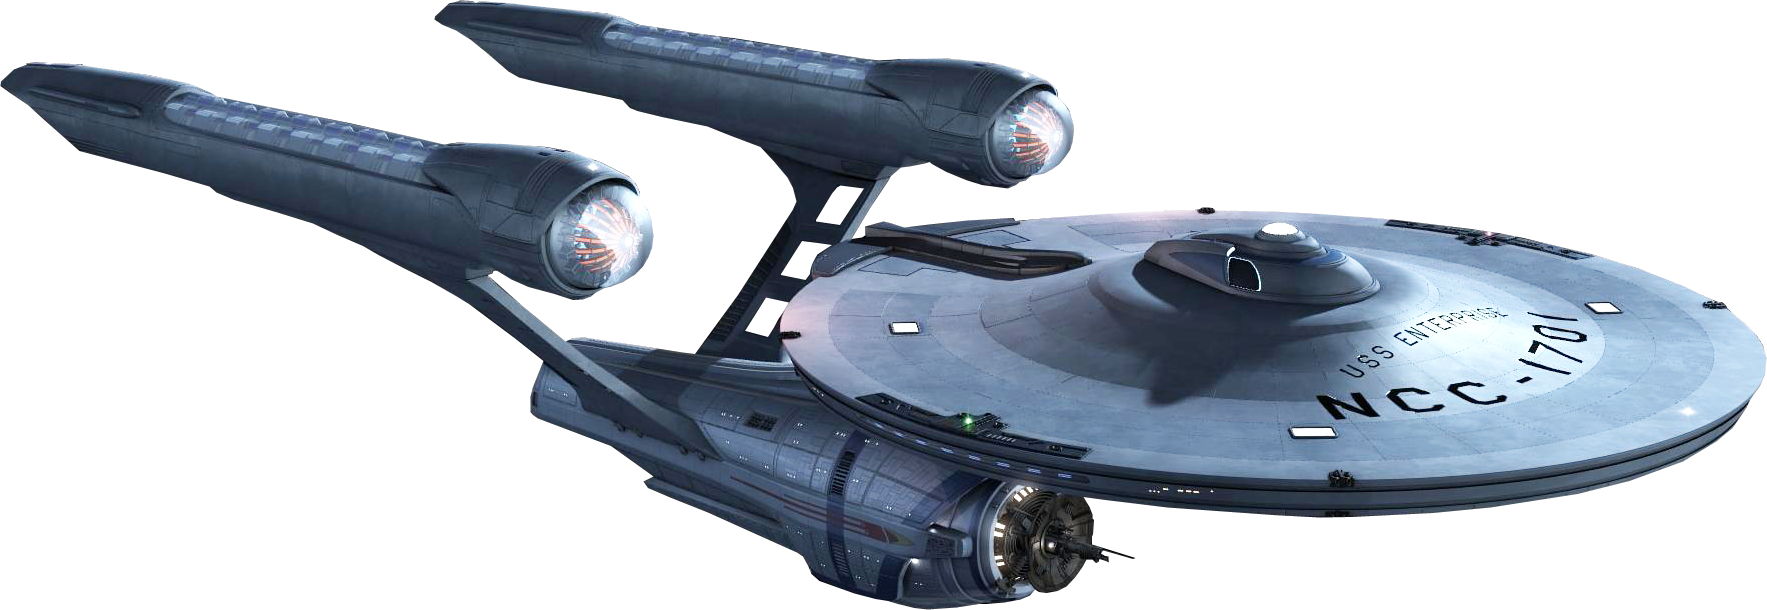 Uss Enterprise Png Pluspng Co Starship Enterprise Uss Enterprise Starship